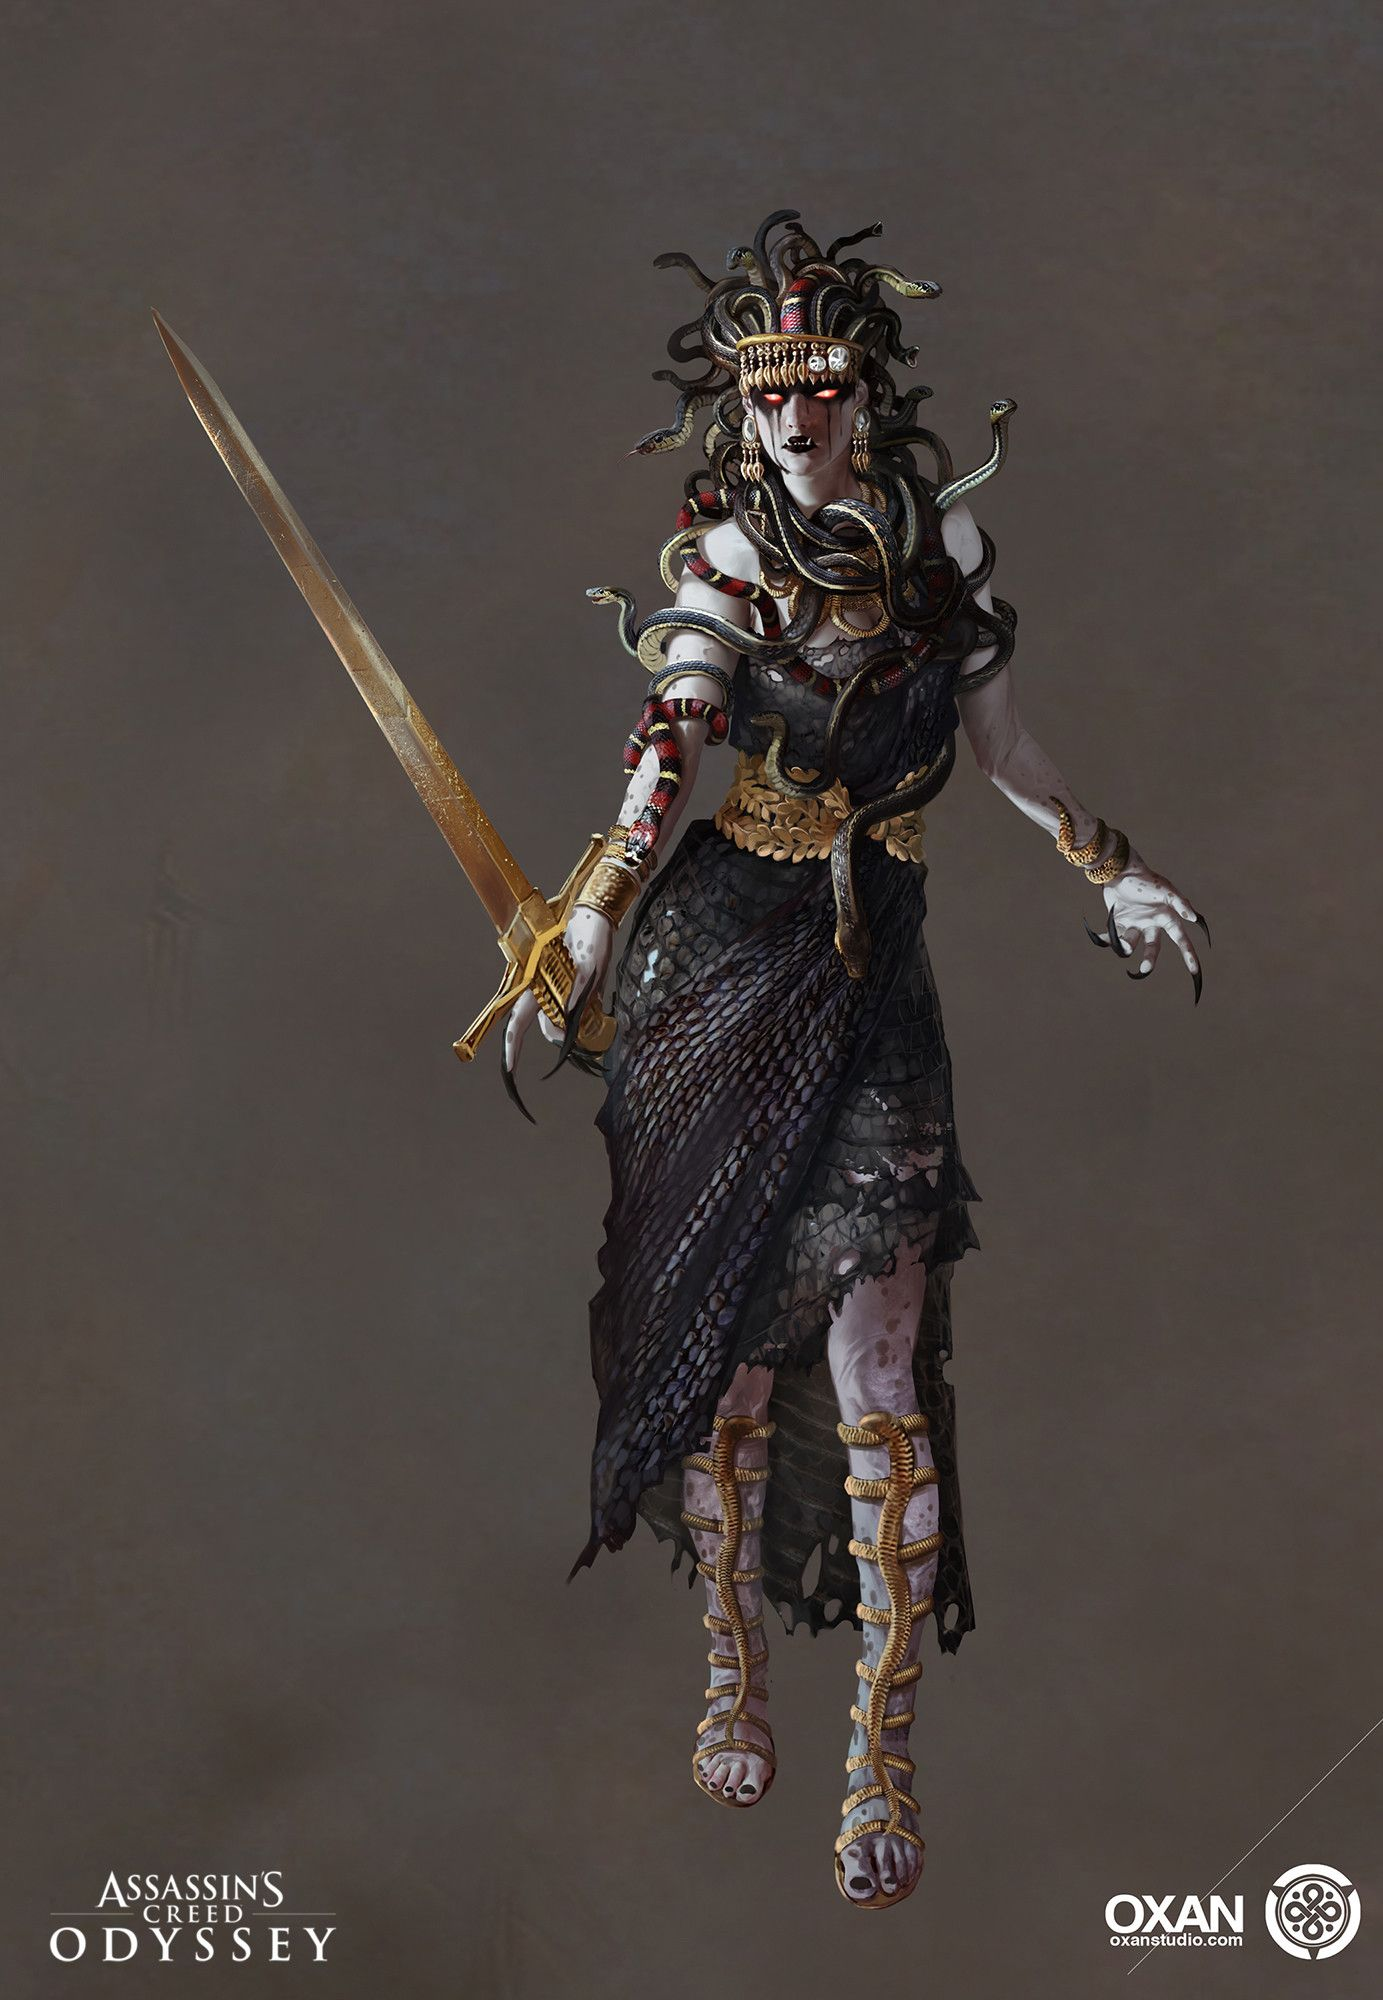 Assassin's Creed Odyssey Medusa : assassin's, creed, odyssey, medusa, Selected, Works., Assassin', Creed, Odyssey's, Character, Development, Ubisoft, Quebec, Assassins, Odyssey,, Artwork